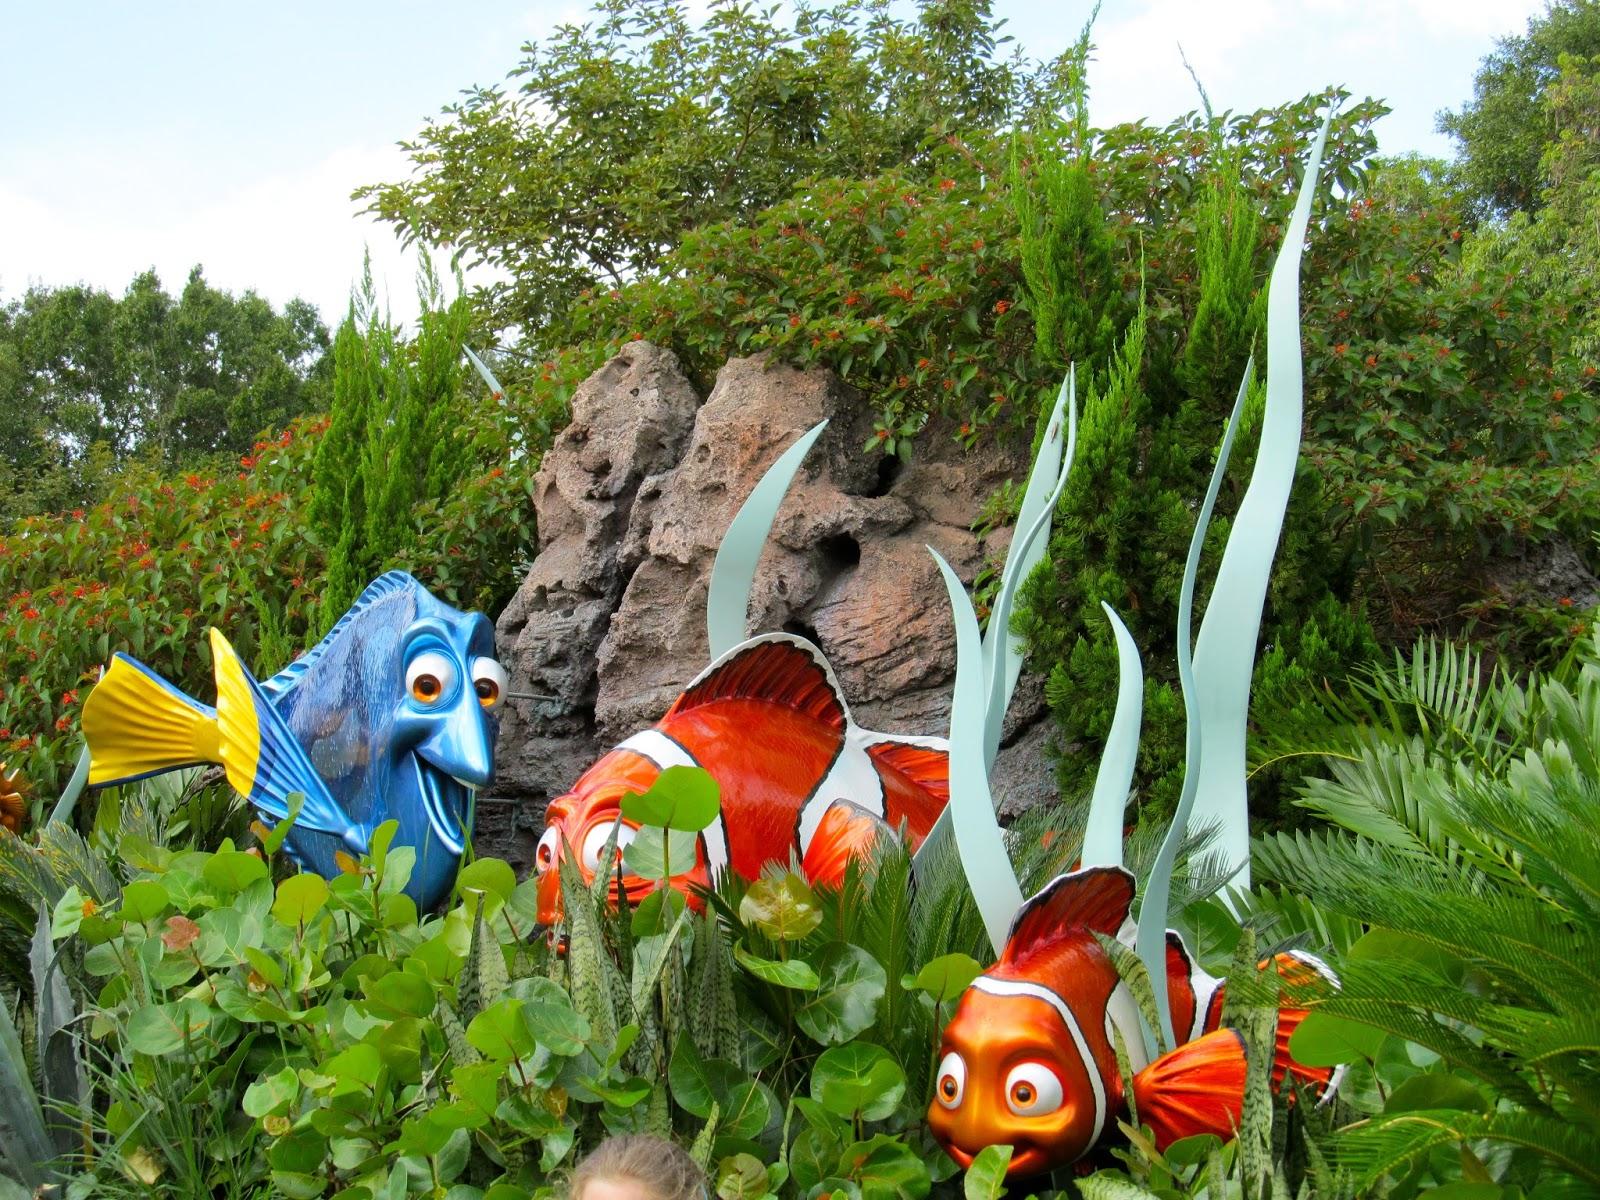 Nemo at Epcot at the Walt Disney World Resort - Orlando, FL - Ouroutdoortravels.blogspot.com